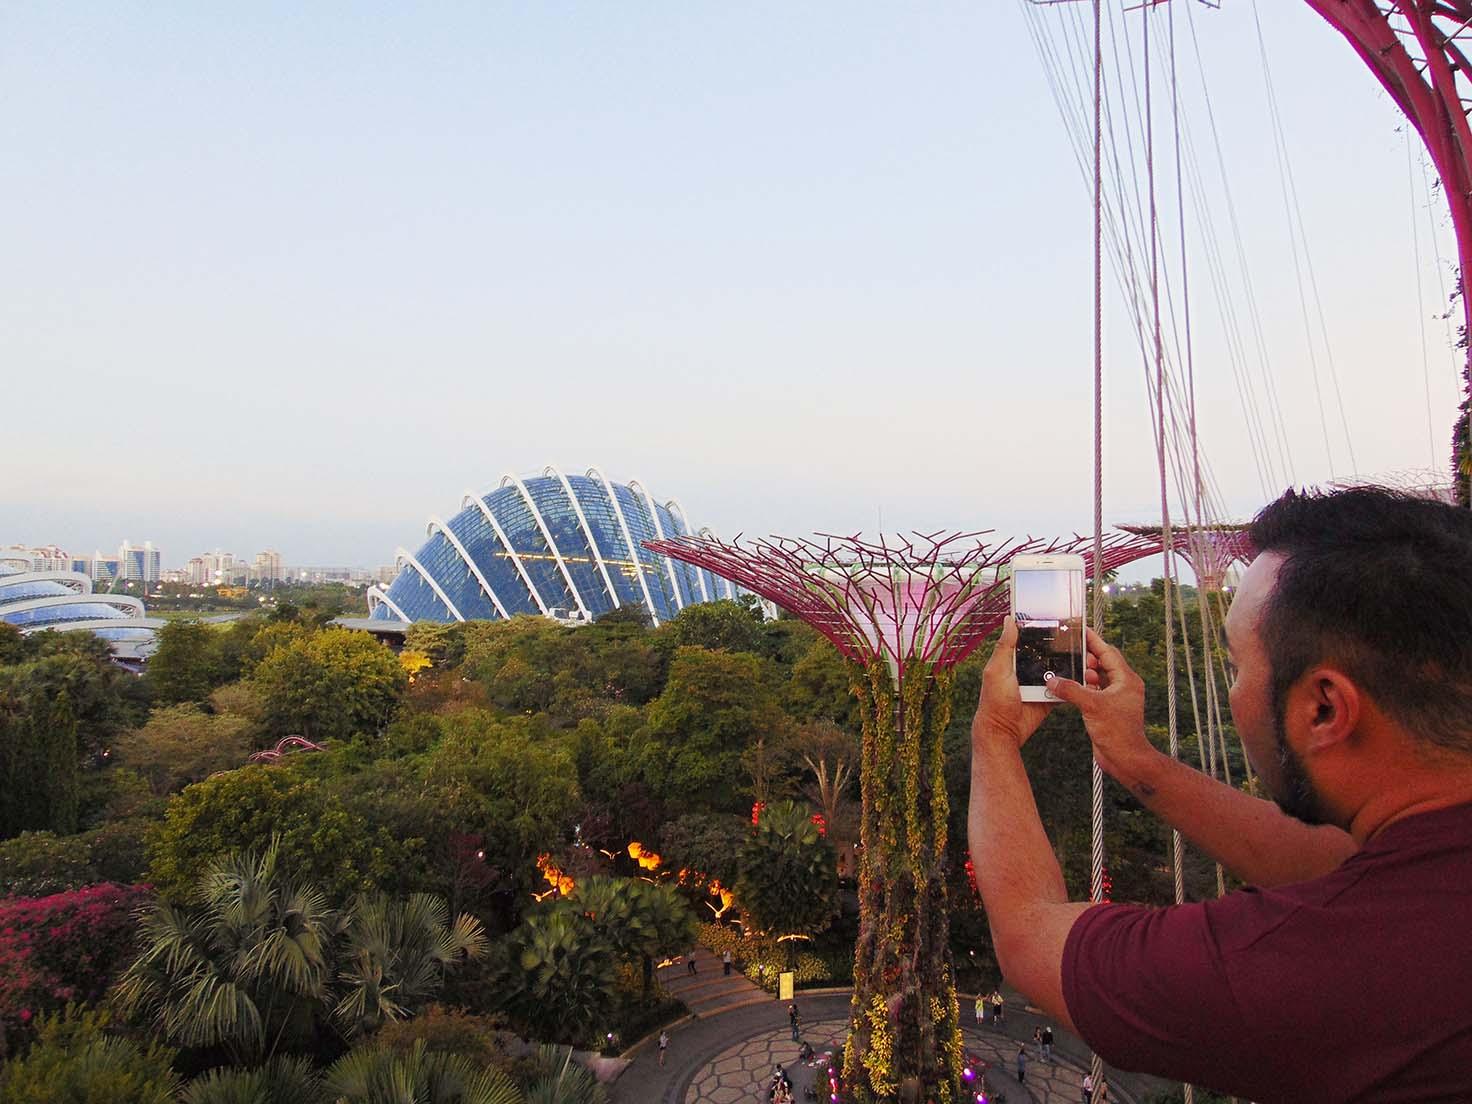 OCBC Skyway Singapura, Tempat yang Cocok buat Prewedding di Singapura, Garden Rhapsody, Jam Operasi dan Tiket OCBC Skyway, terms and condition of OCBC Skyway singapore